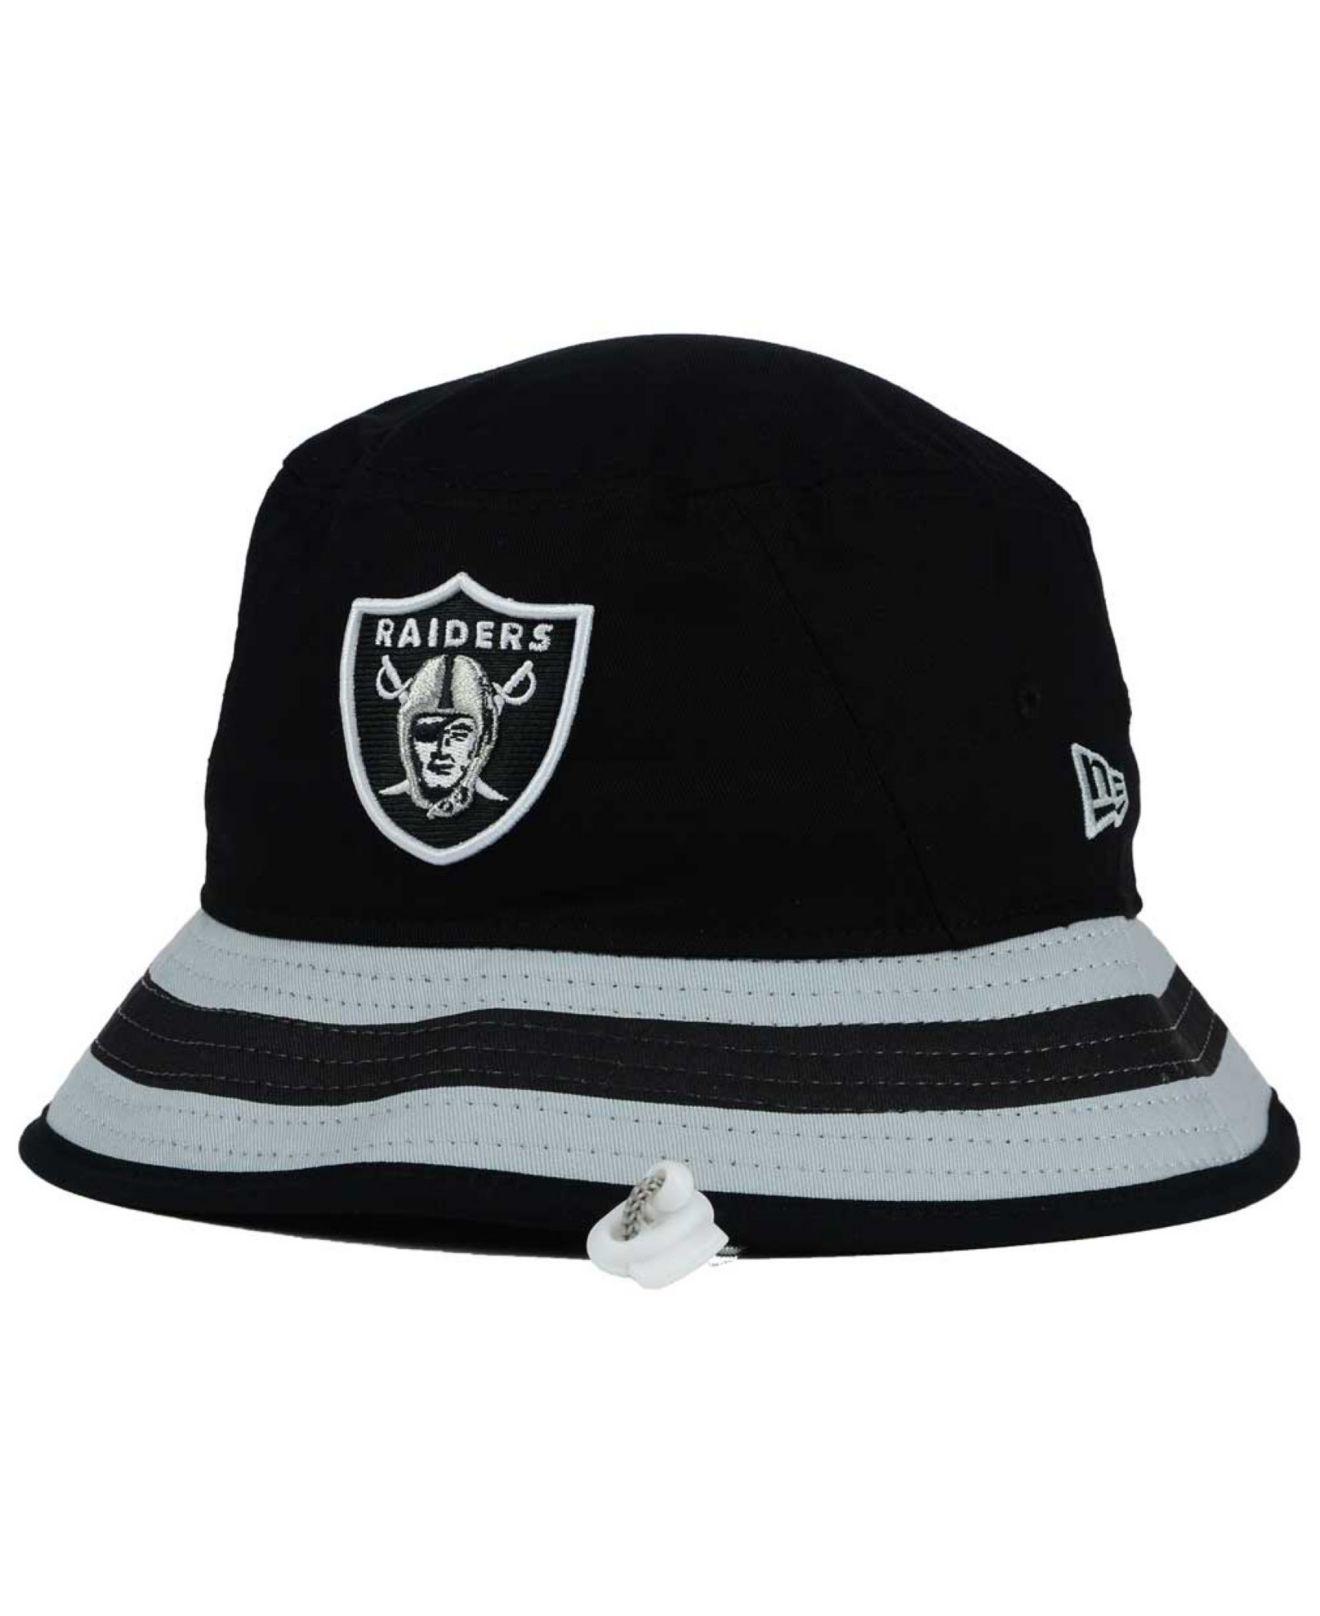 a5385c23292 Lyst - KTZ Oakland Raiders Team Stripe Bucket Hat in Black for Men